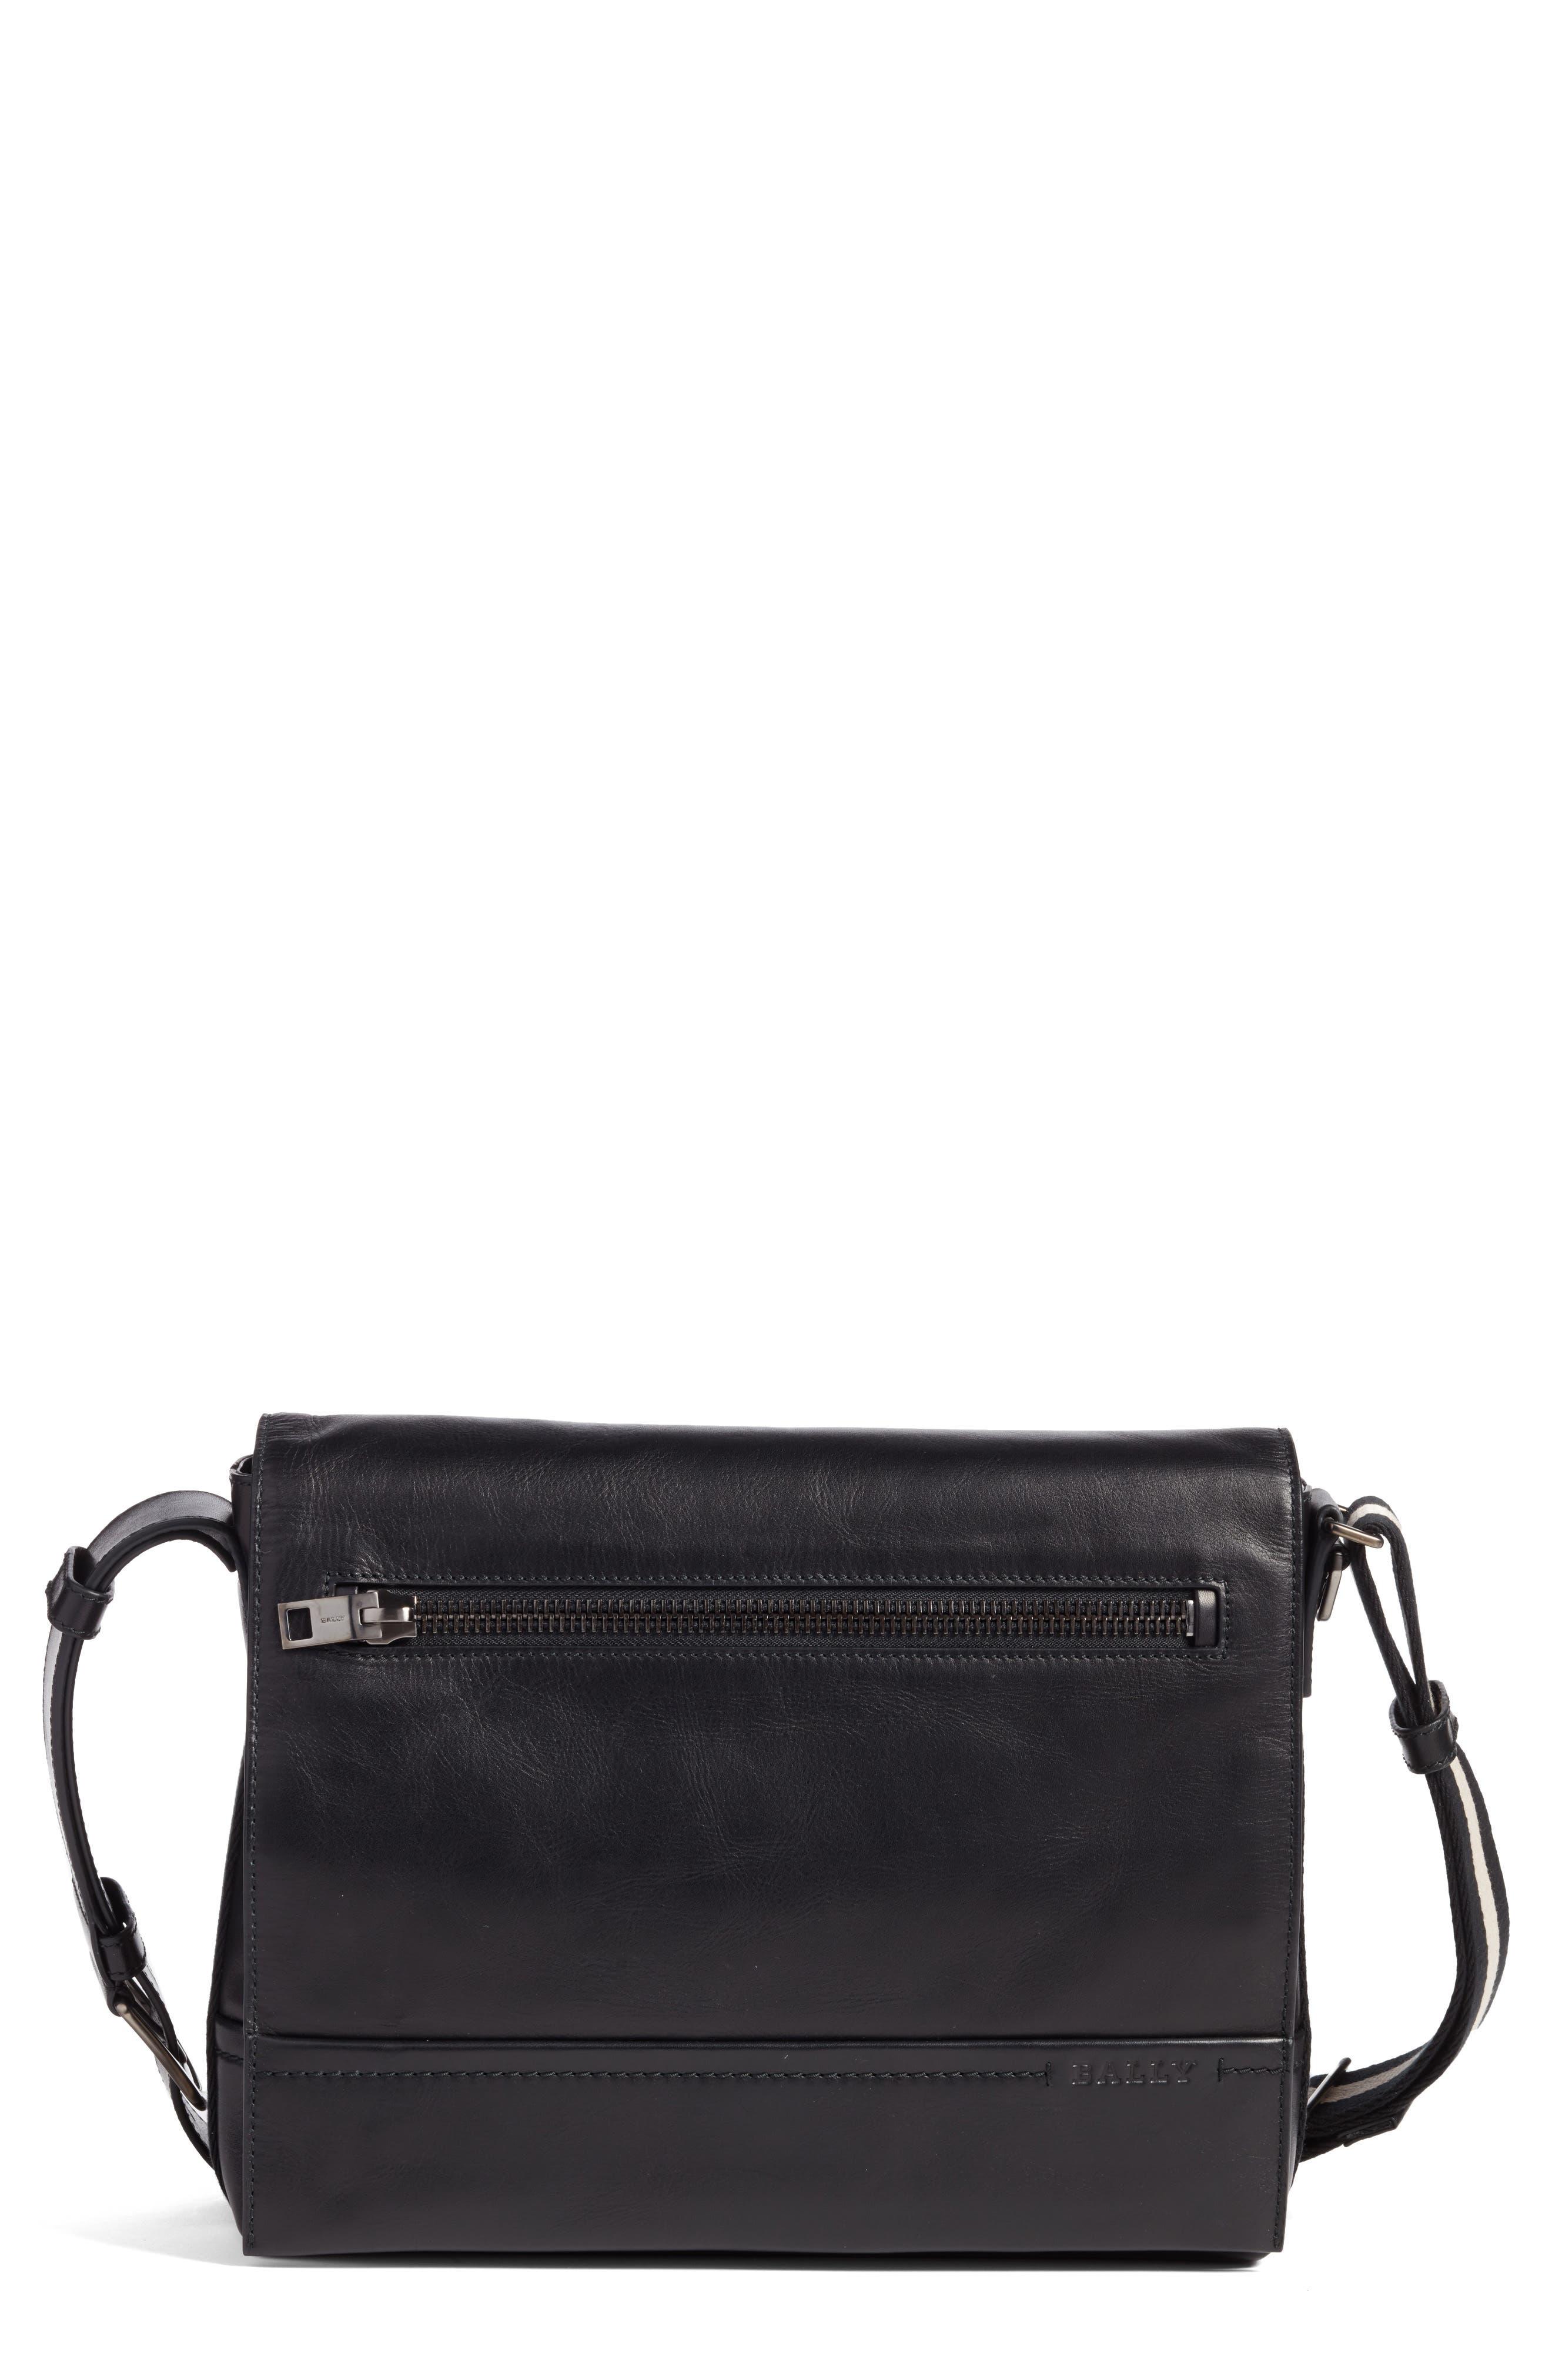 Tamrac Leather Messenger Bag,                             Main thumbnail 1, color,                             001